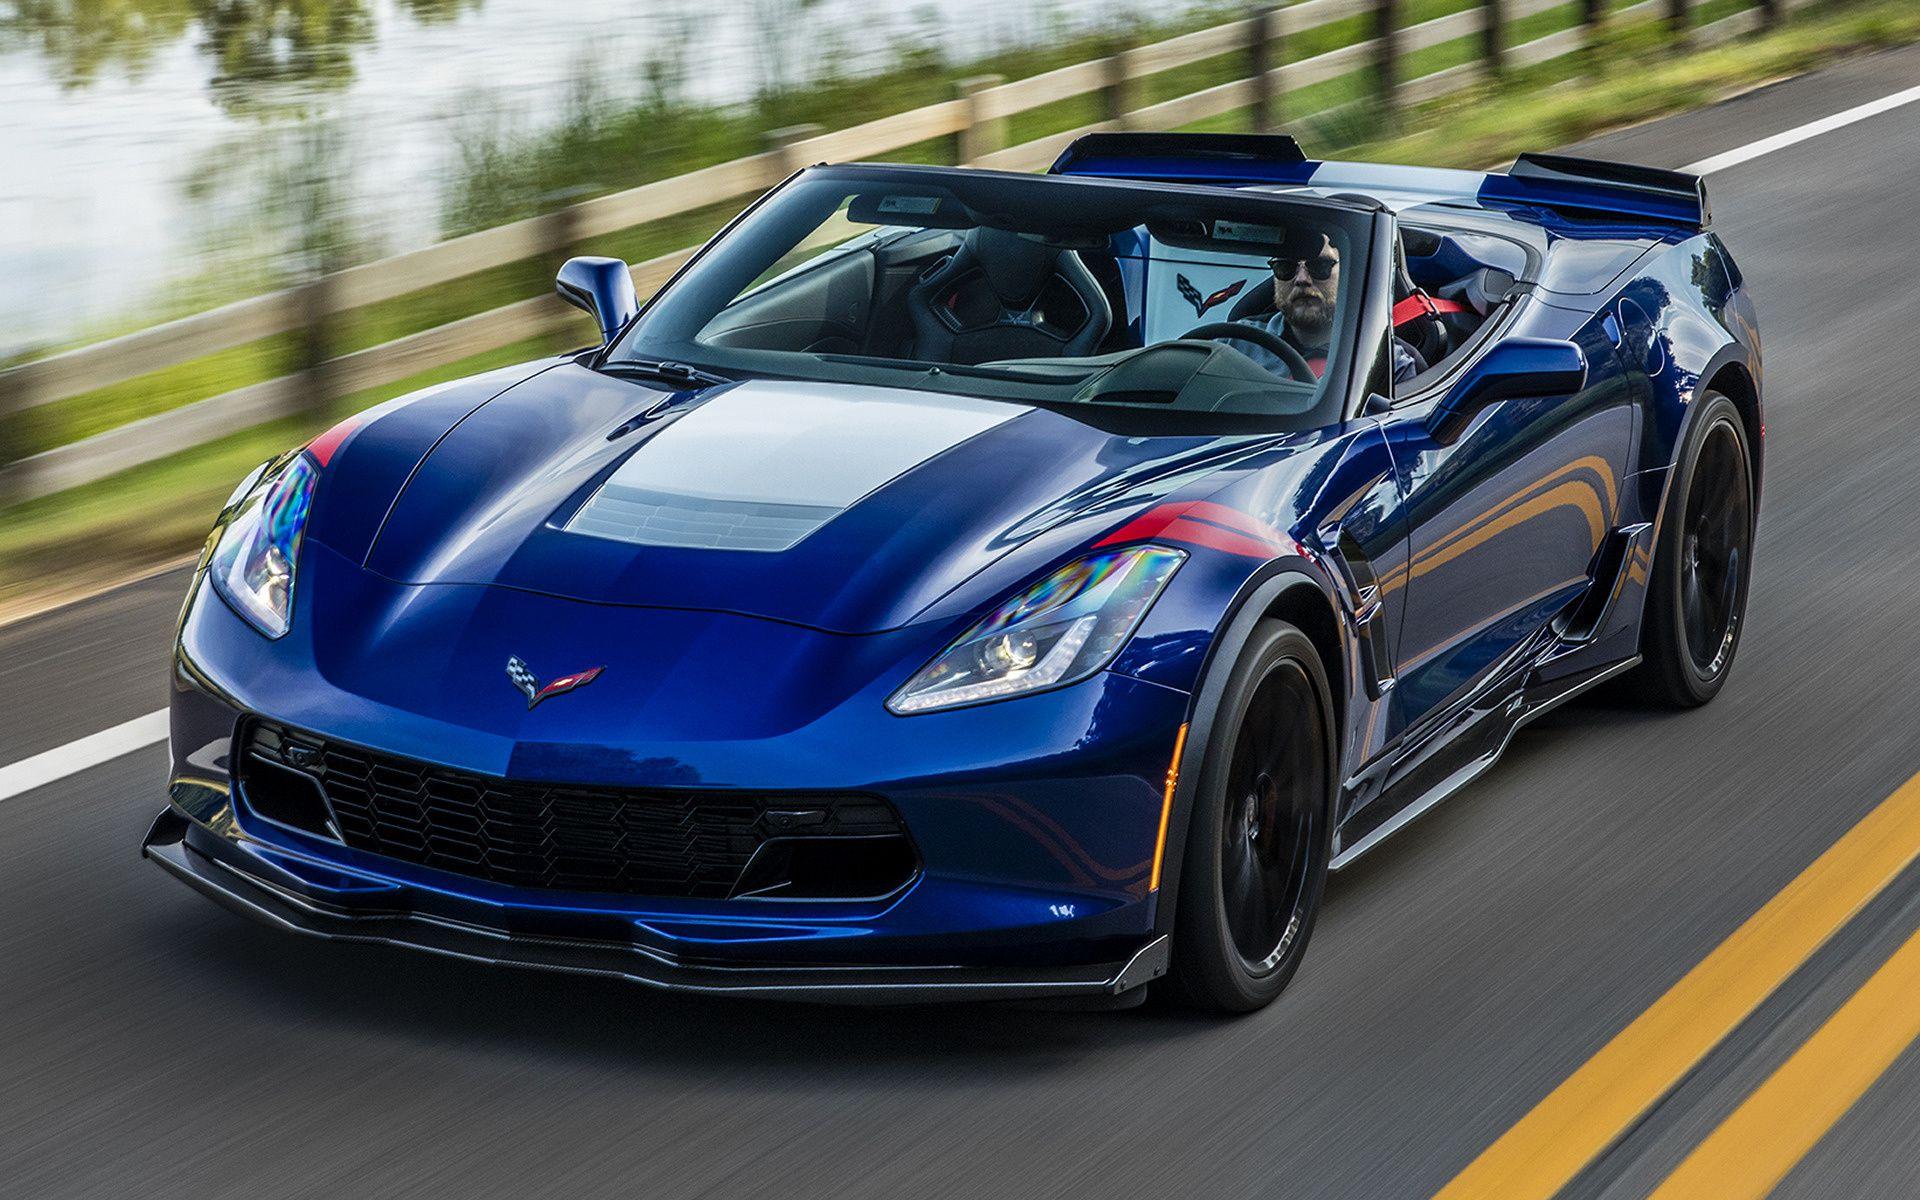 New Car Theme For Windows With Chevrolet Corvette Grand Sport Corvette Grand Sport Chevrolet Corvette Corvette